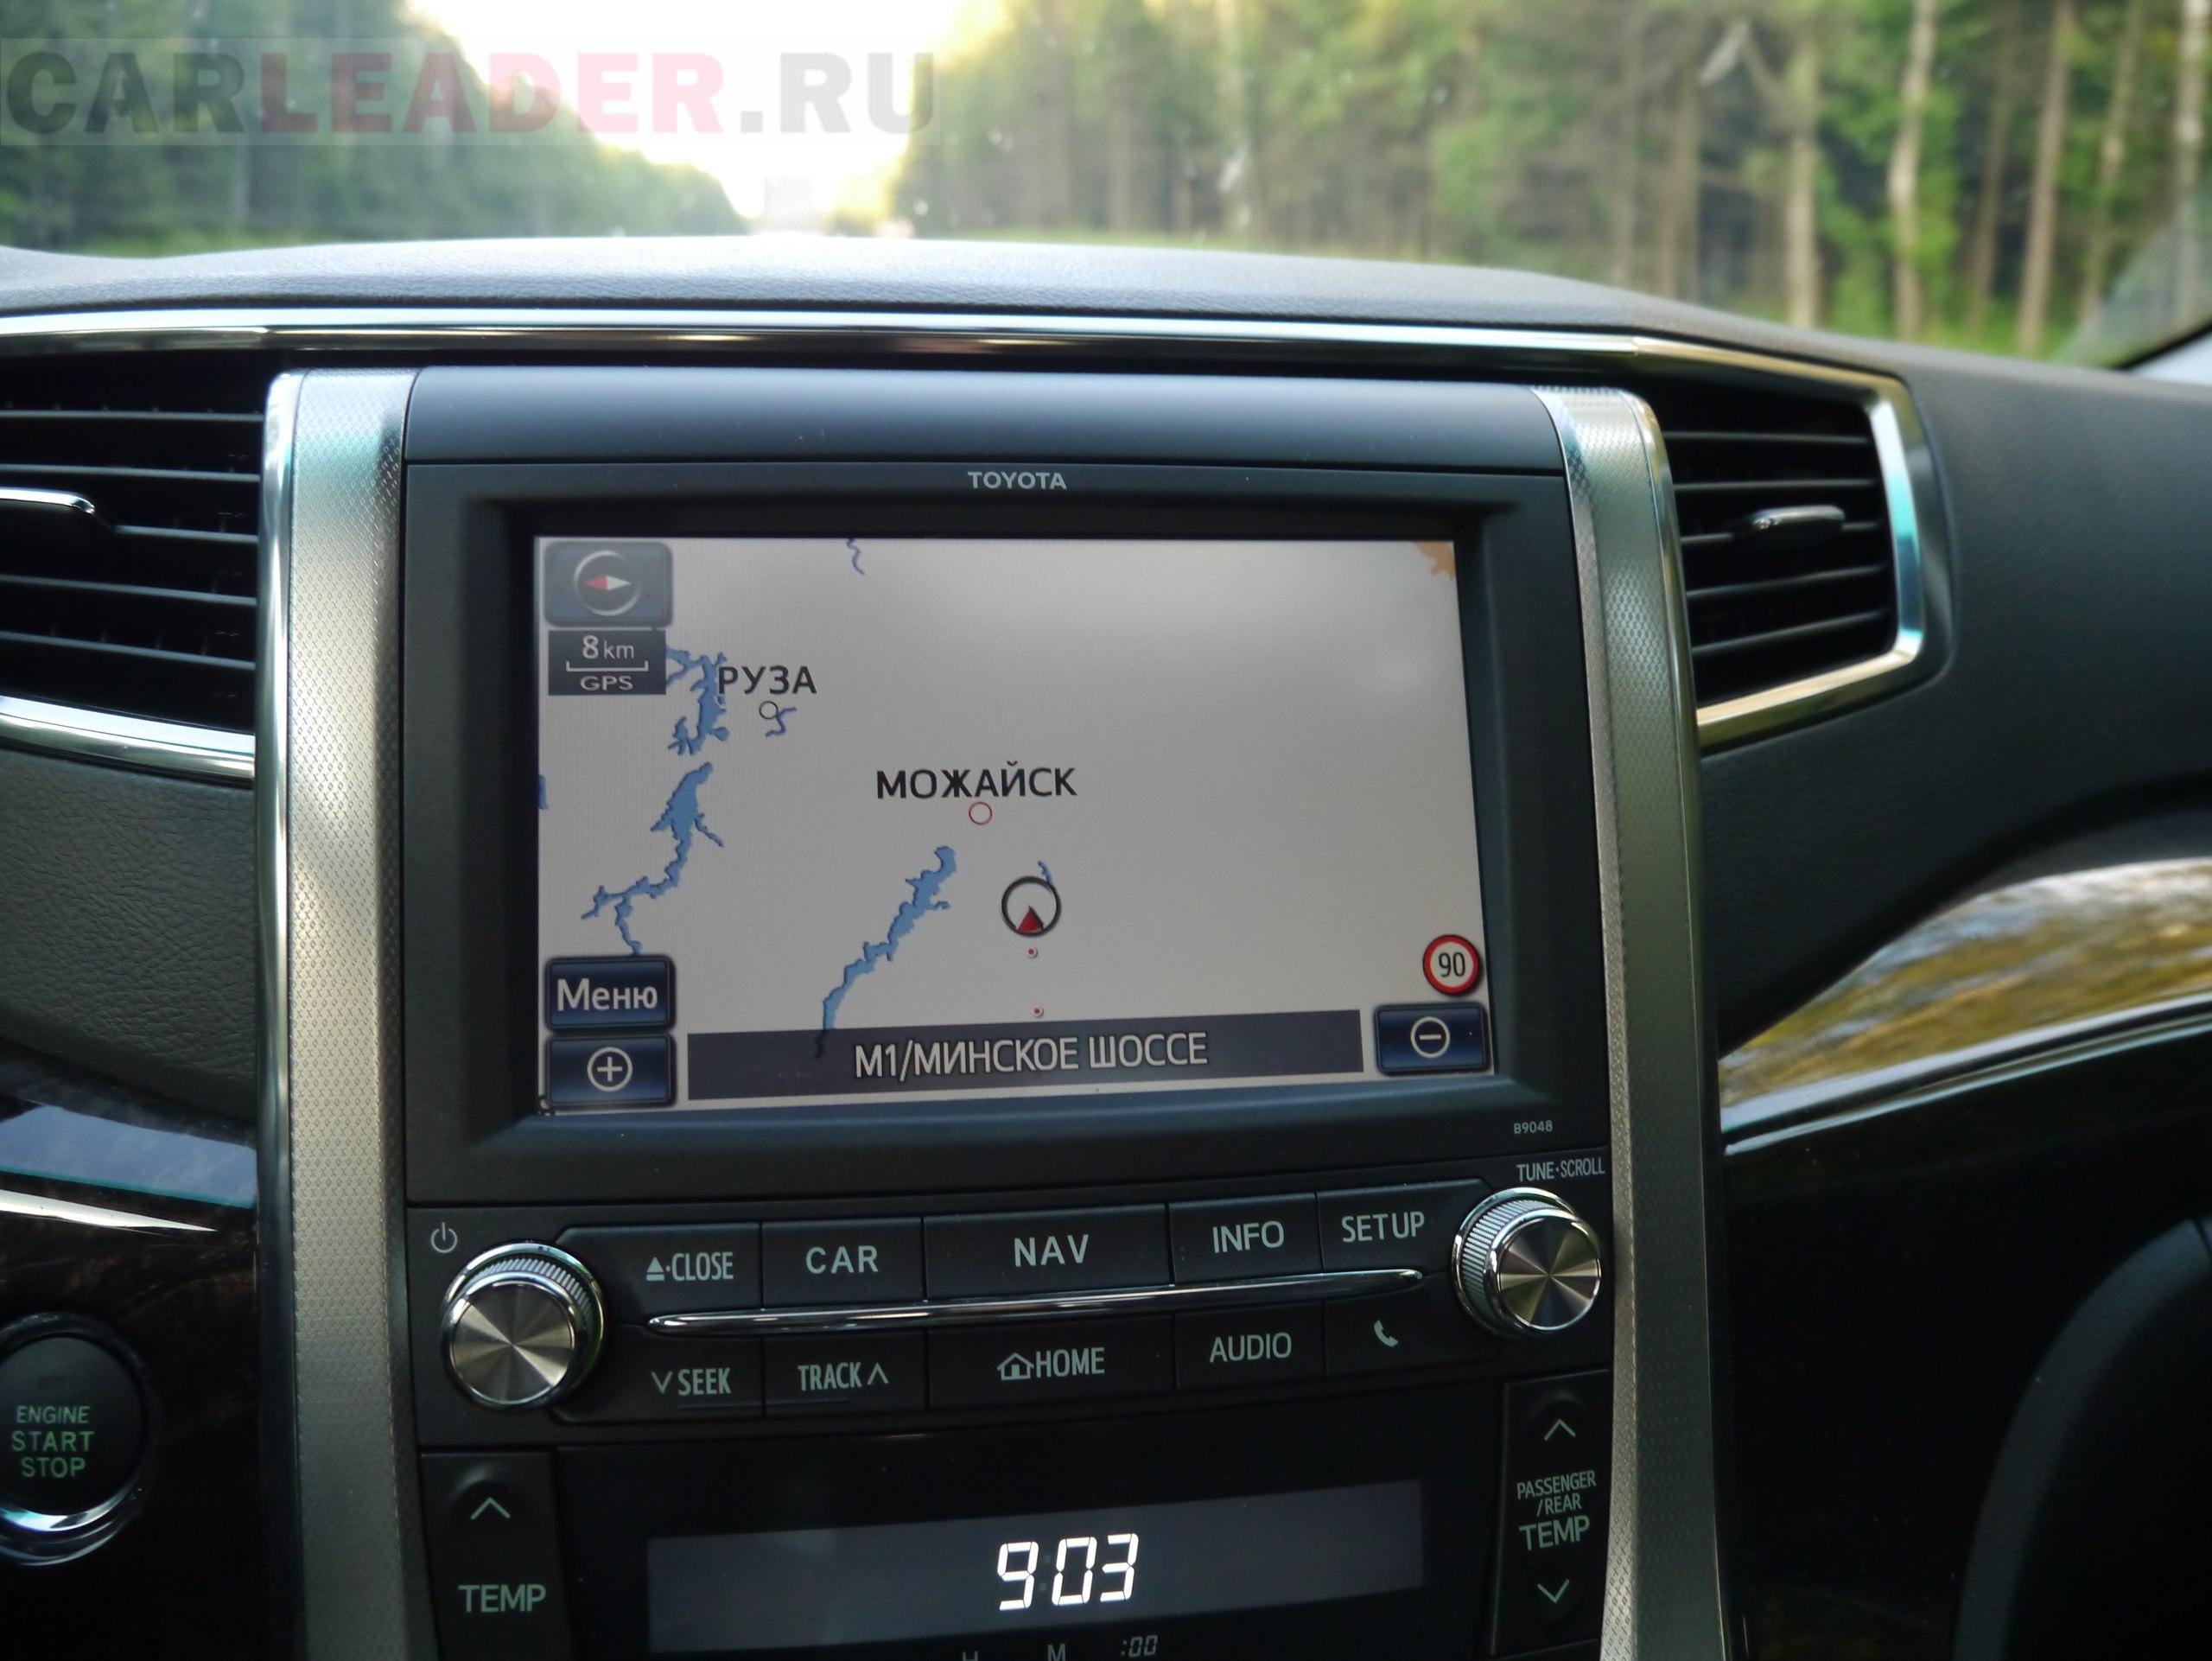 Навигация Тойота АЛьфард 2013